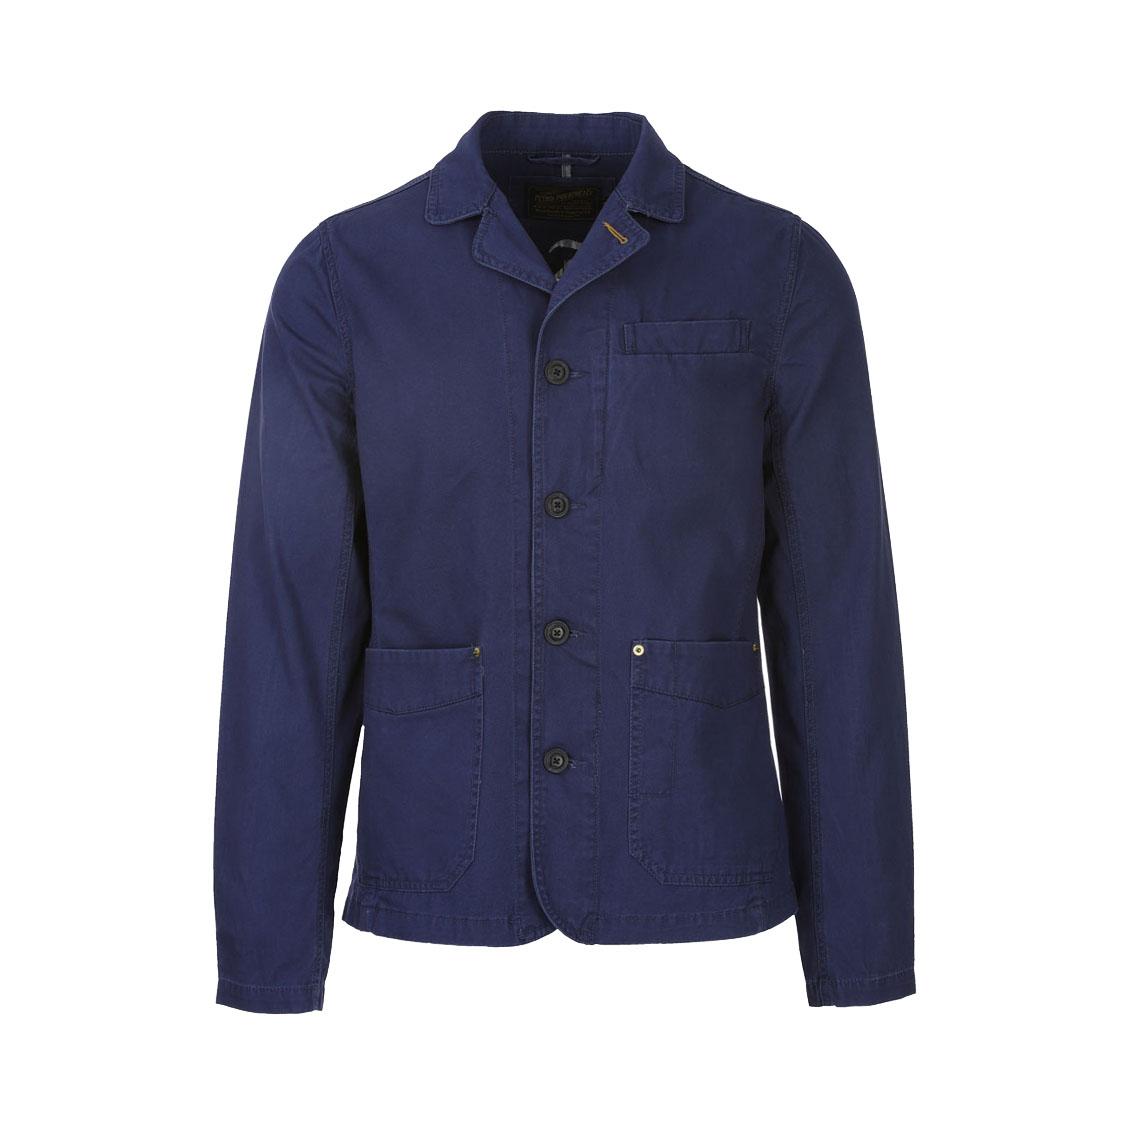 Veste  en coton stretch bleu marine